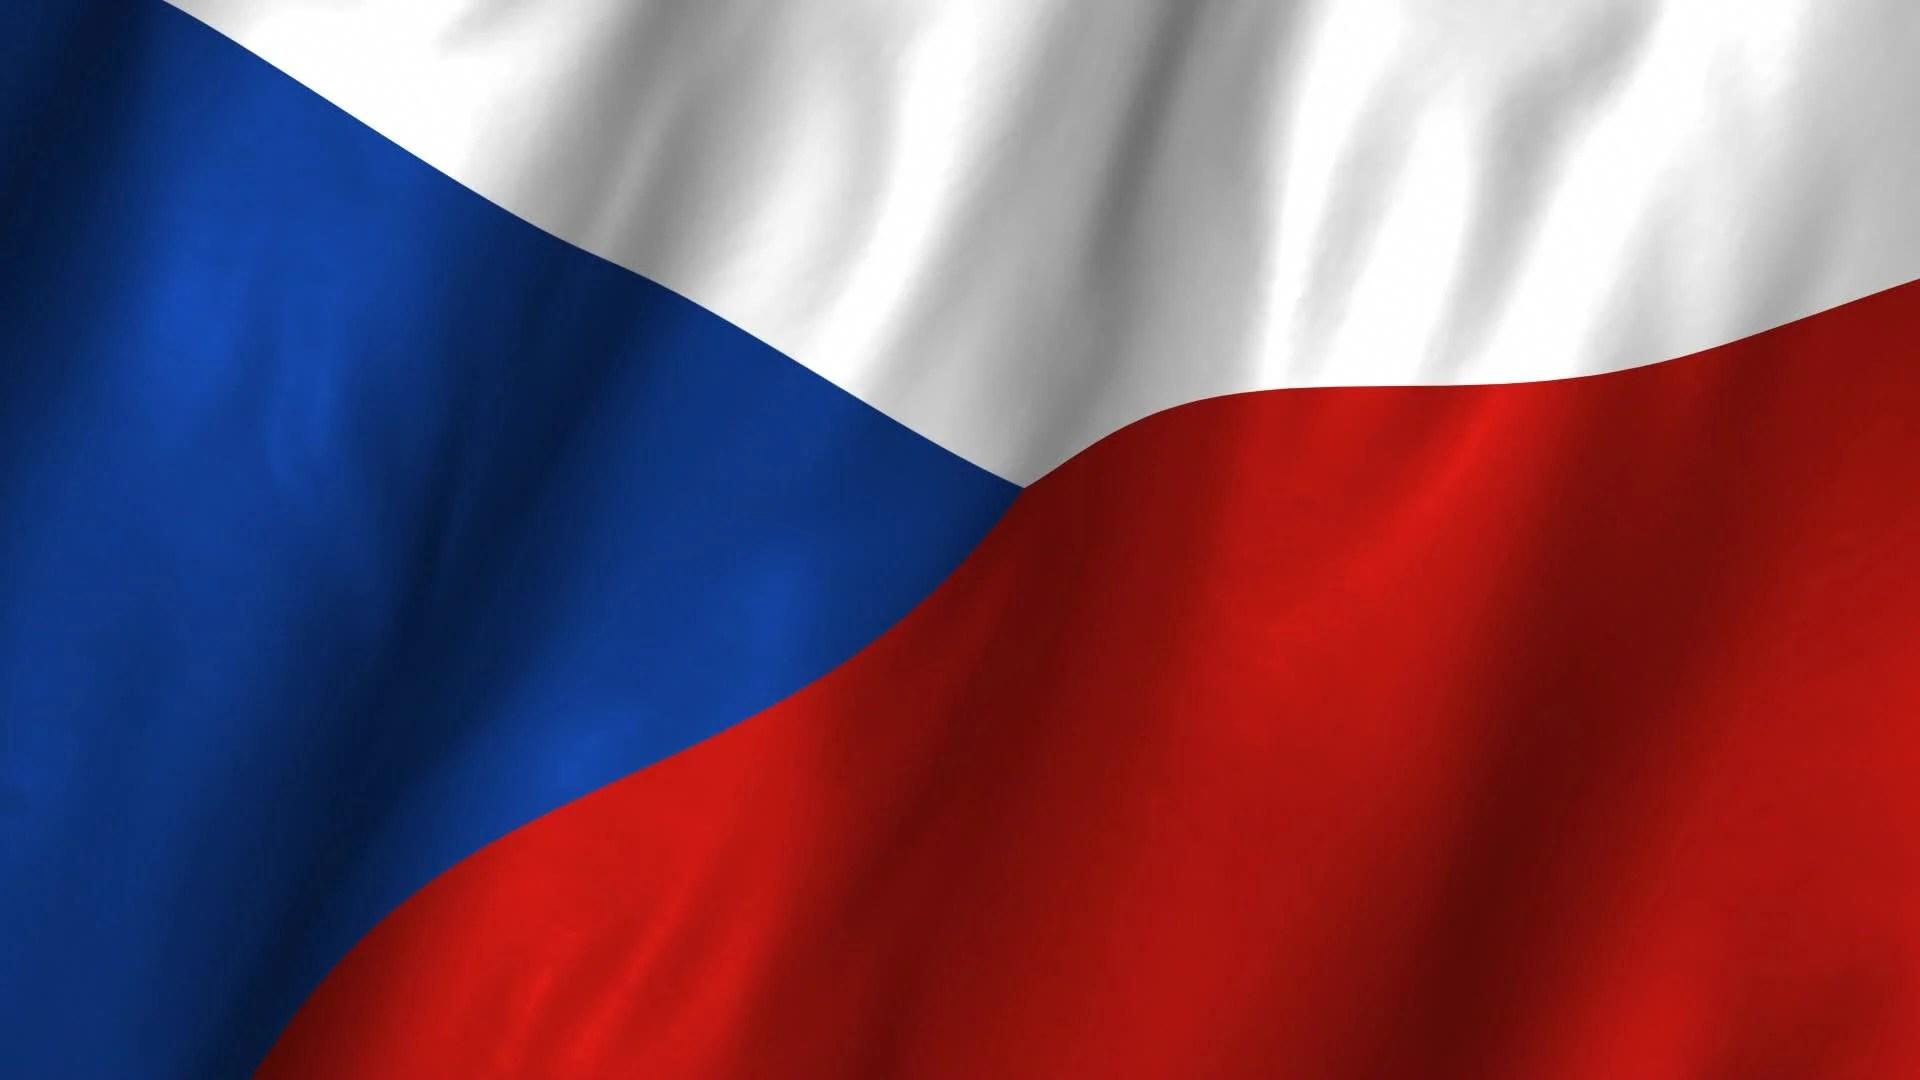 Wallpapers Free Download Hd 3d Czech Republic Waving Flag Video Clip 12250682 Pond5